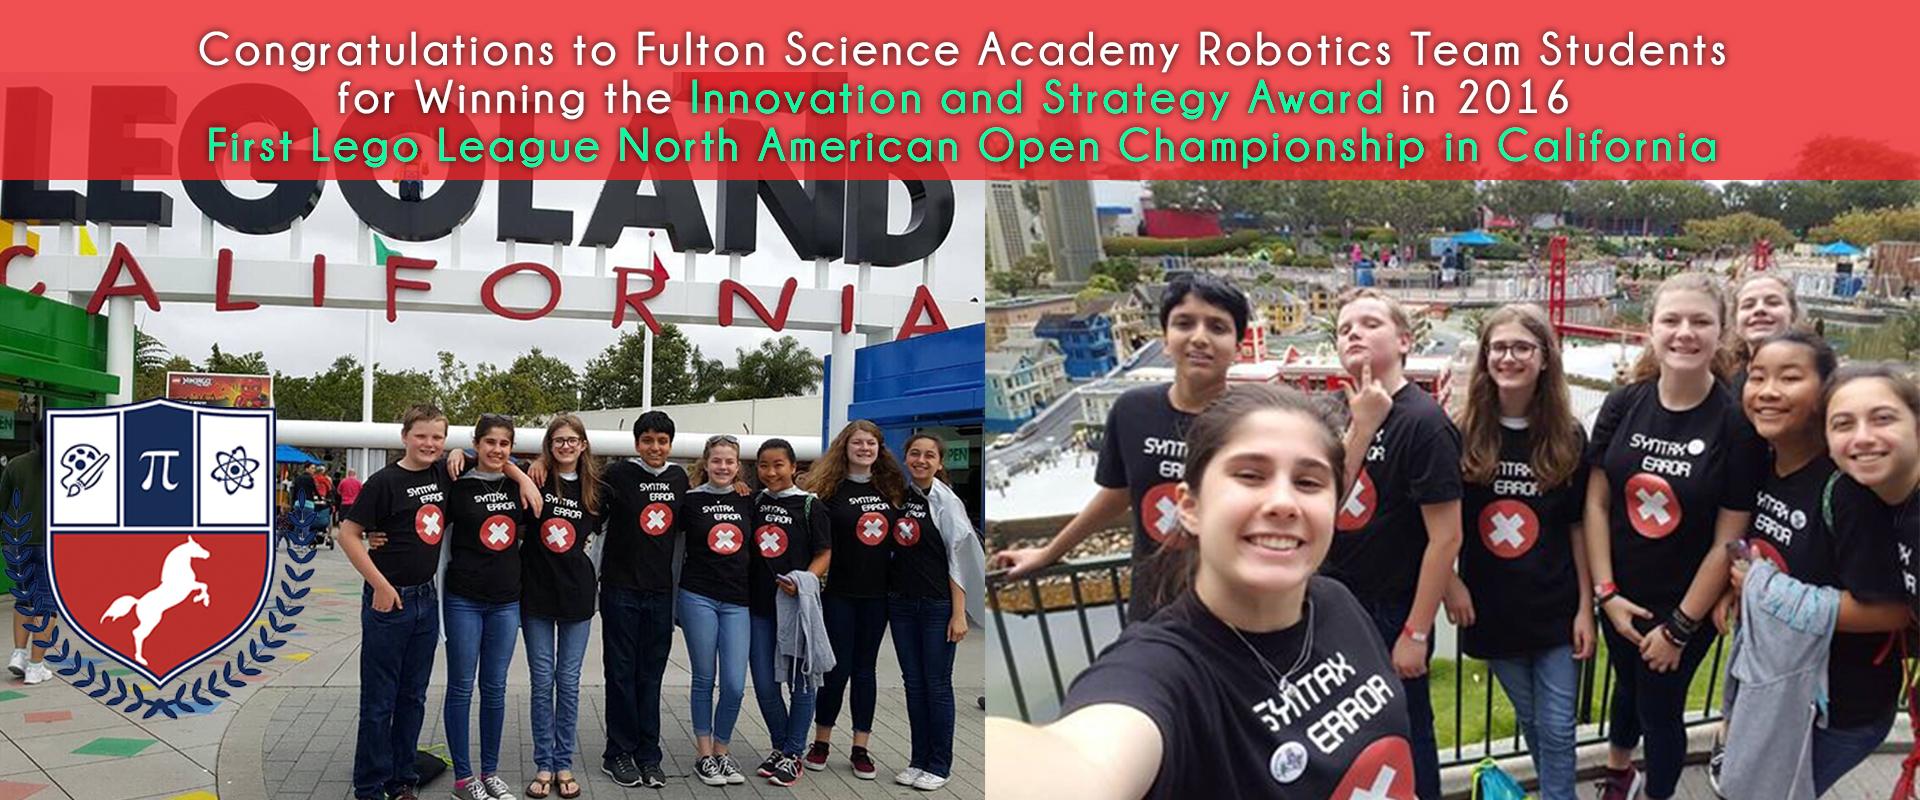 Fulton Science Academy Private School Robotics National Champion.jpg